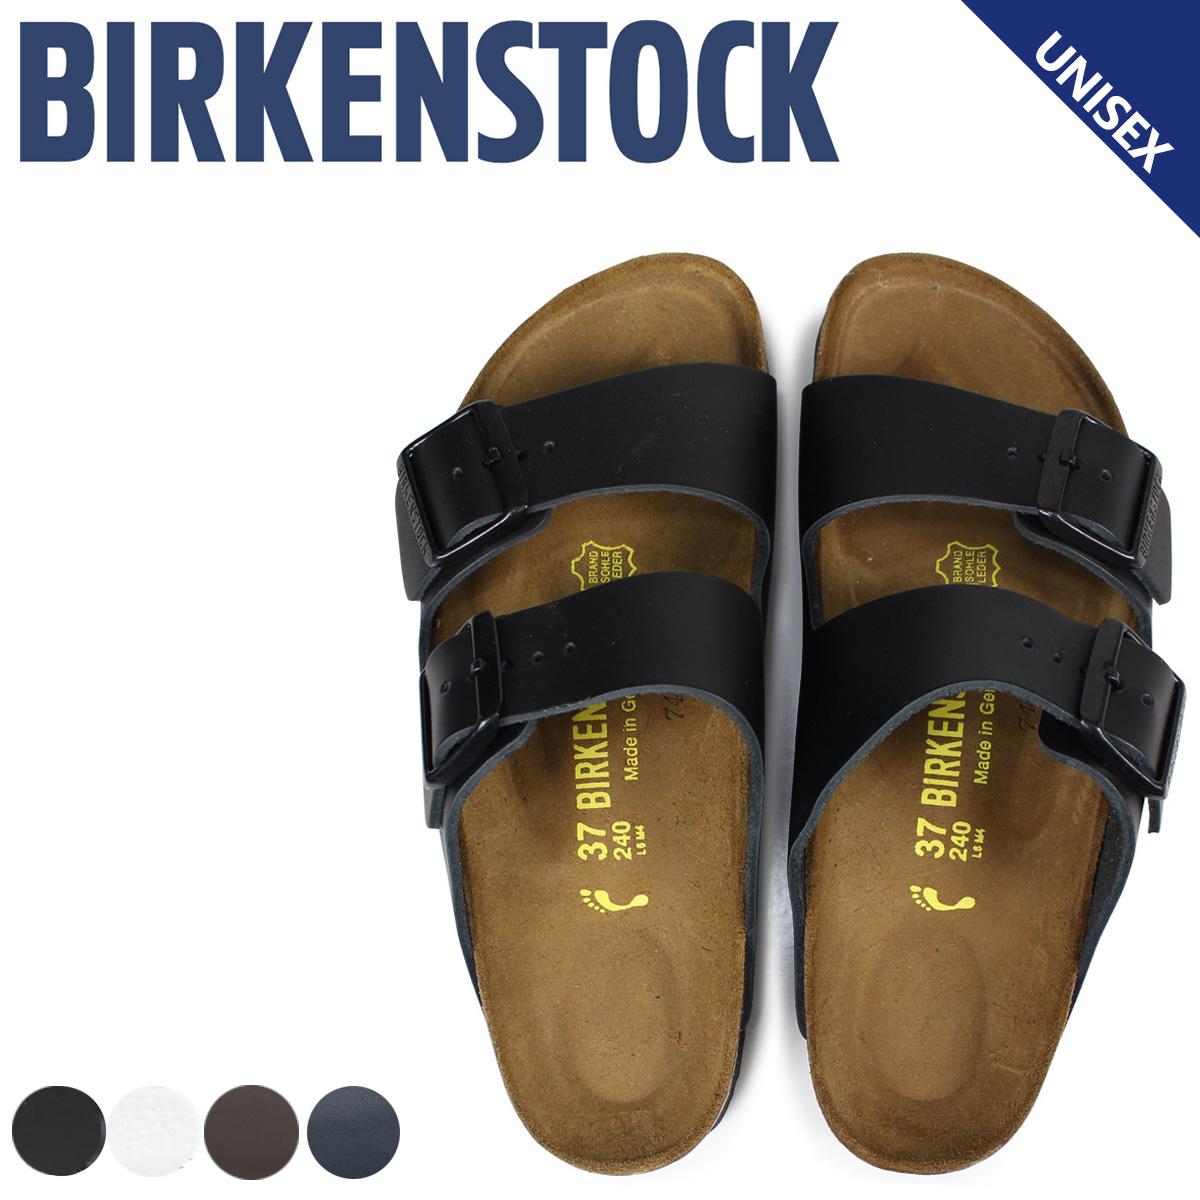 2e199c0b02ea Whats up Sports   SOLD OUT  BIRKENSTOCK-Birkenstock Arizona vilken Sandals  usually wide ARIZONA NL mens